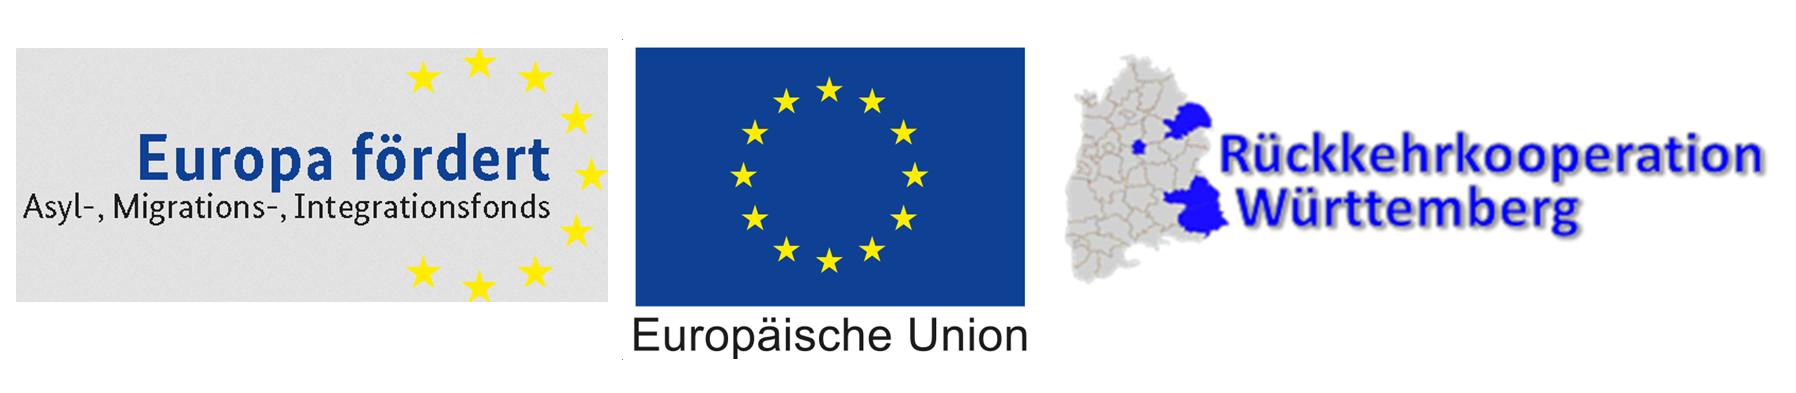 Logos Rückkehrberatung